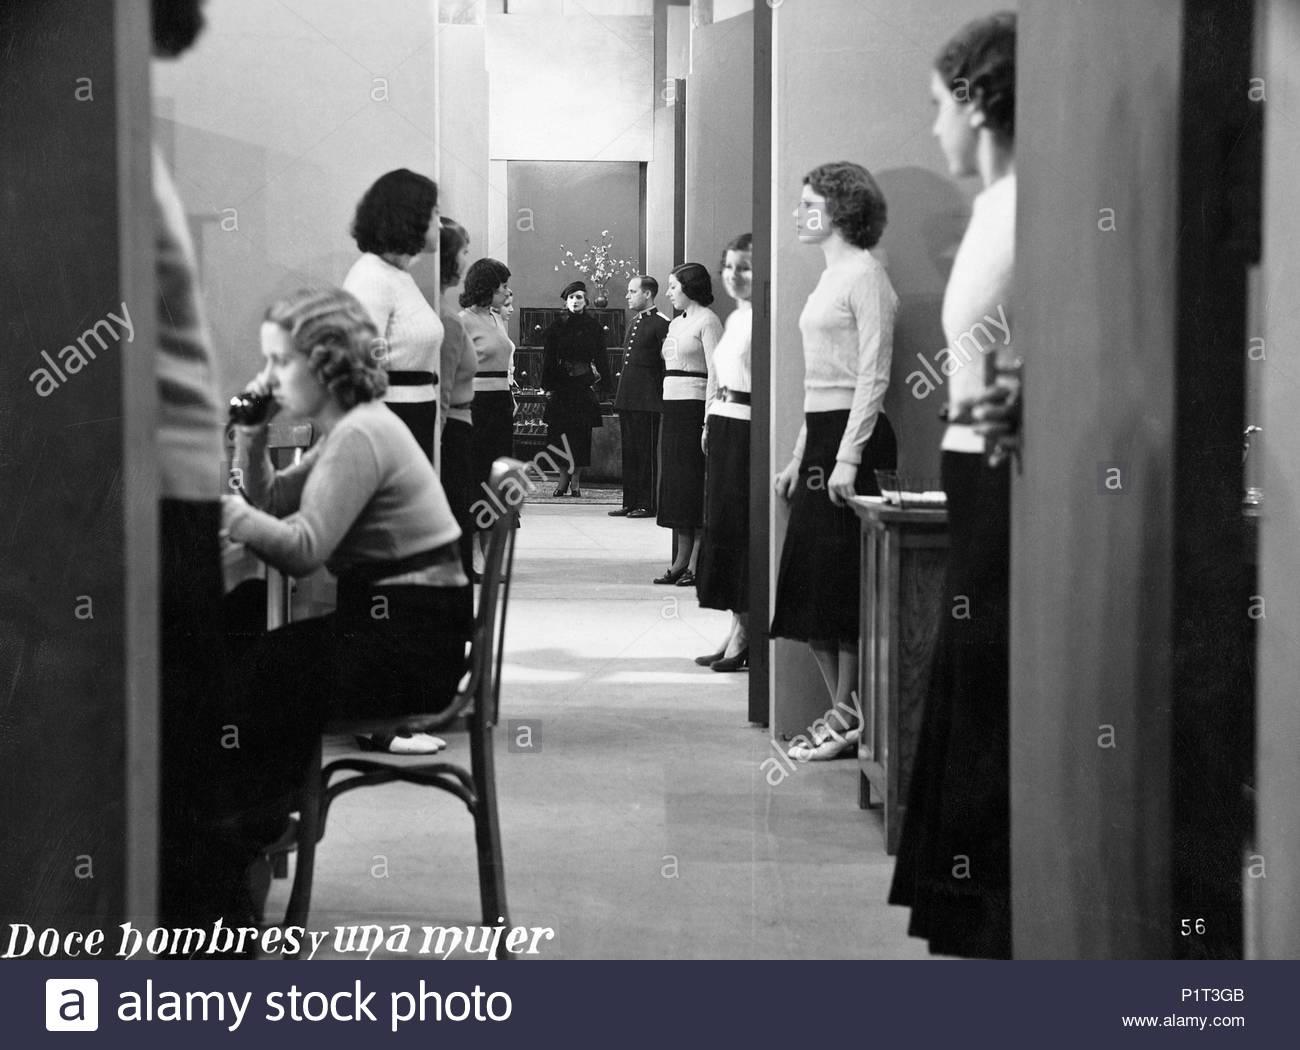 Original Film Title: DOCE HOMBRES Y UNA MUJER.  English Title: TWELVE MEN AND A WOMAN.  Film Director: FERNANDO DELGADO.  Year: 1934. Credit: STAR FILMS S.A. / Album - Stock Image